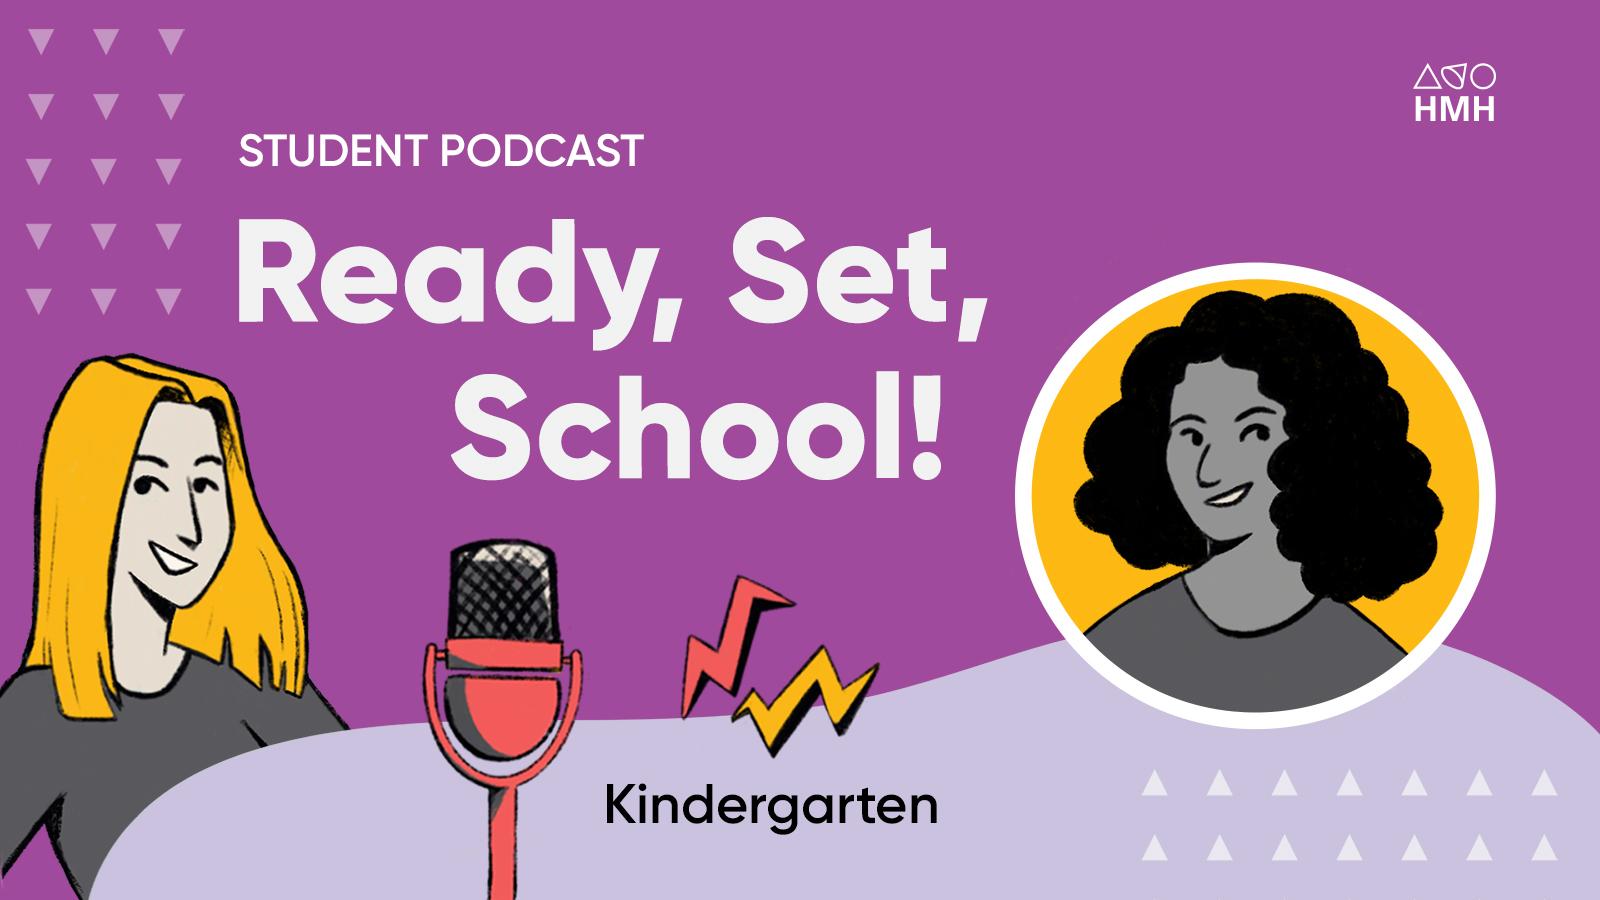 Kindergarten: Ready, Set, School! Podcast